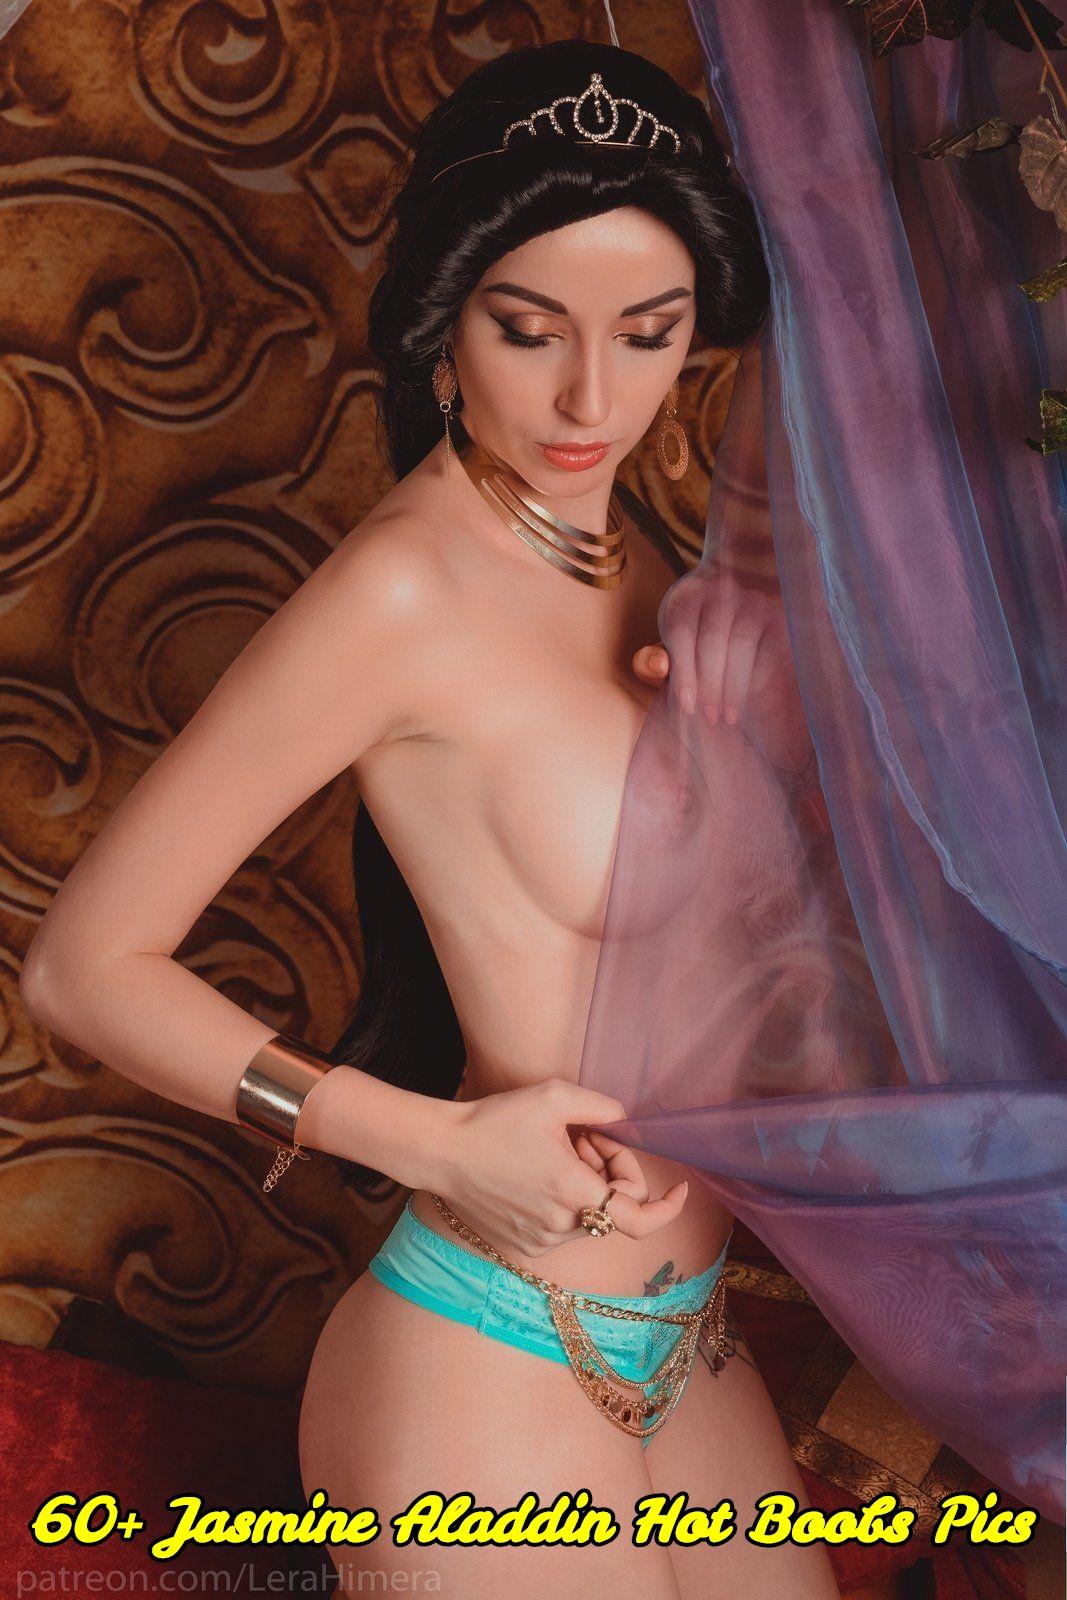 Jasmine Aladdin hot boobs pics